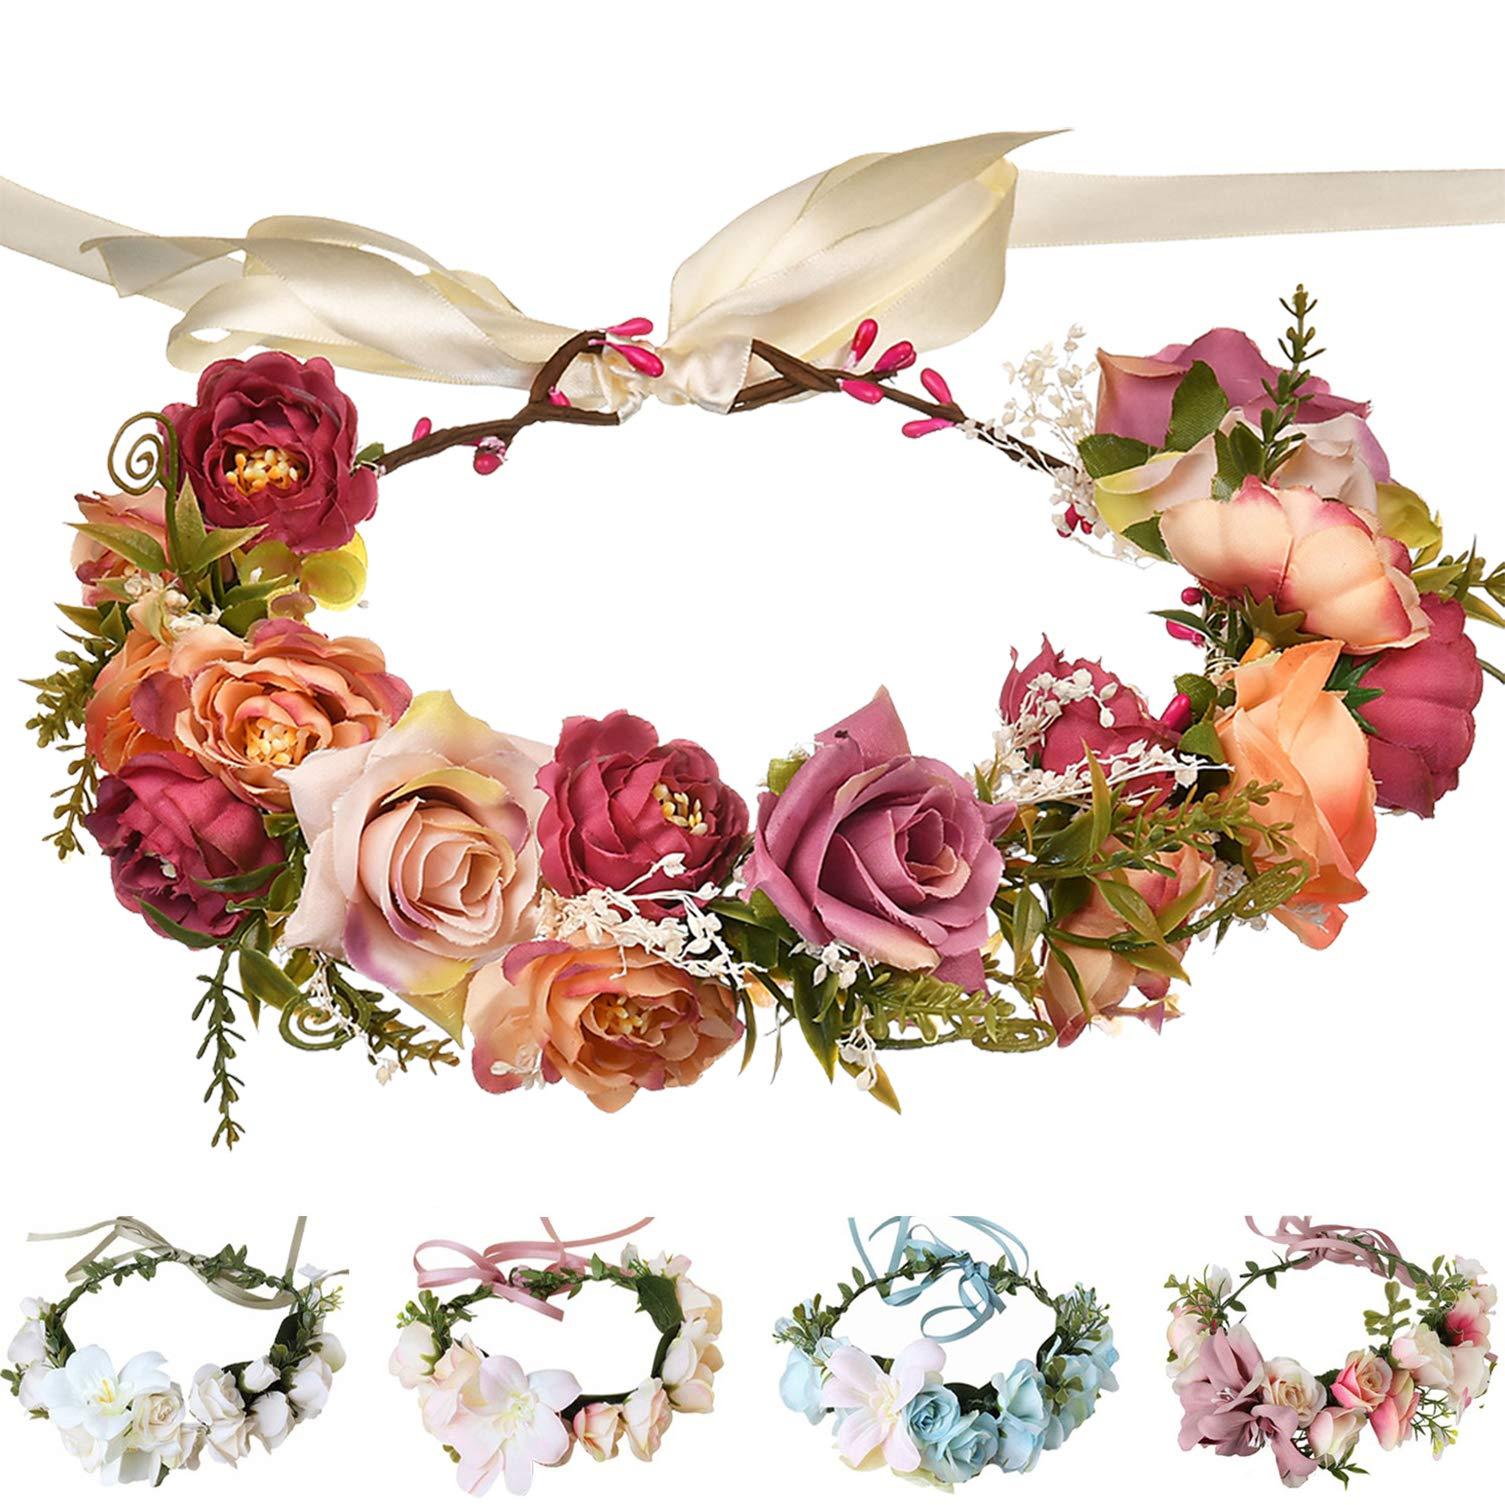 Handmade Adjustable Flower Wreath Headband Halo Floral Crown Garland Headpiece Wedding Festival Party (M-(Pink))